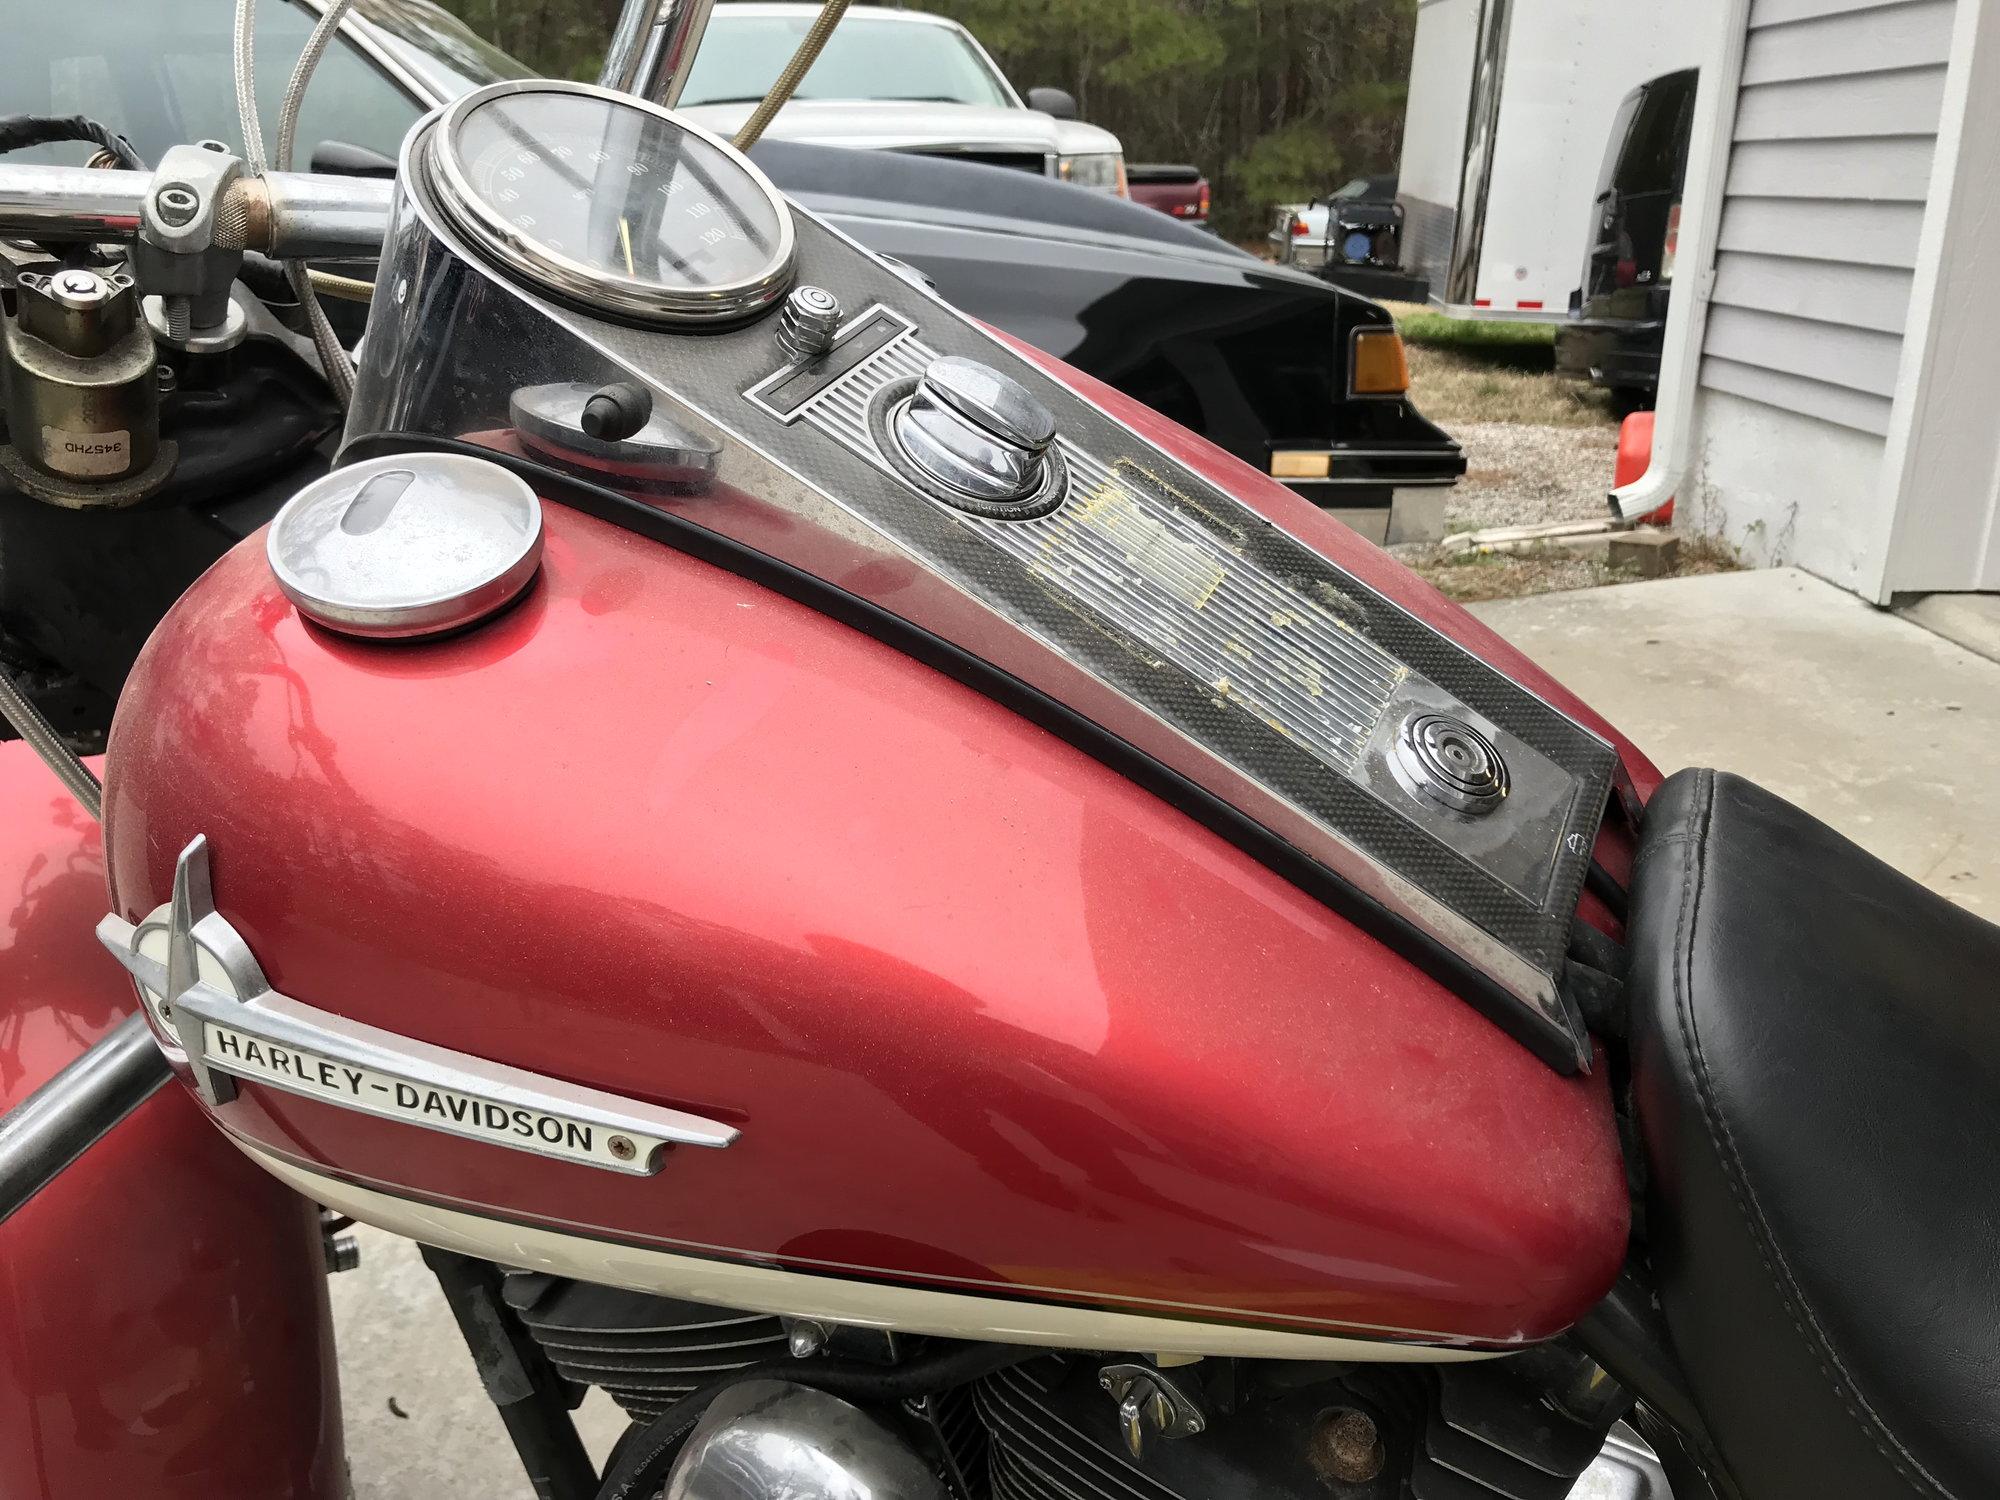 Replica Chrome Oil Tank,fits Harley Davidson motorcycle models